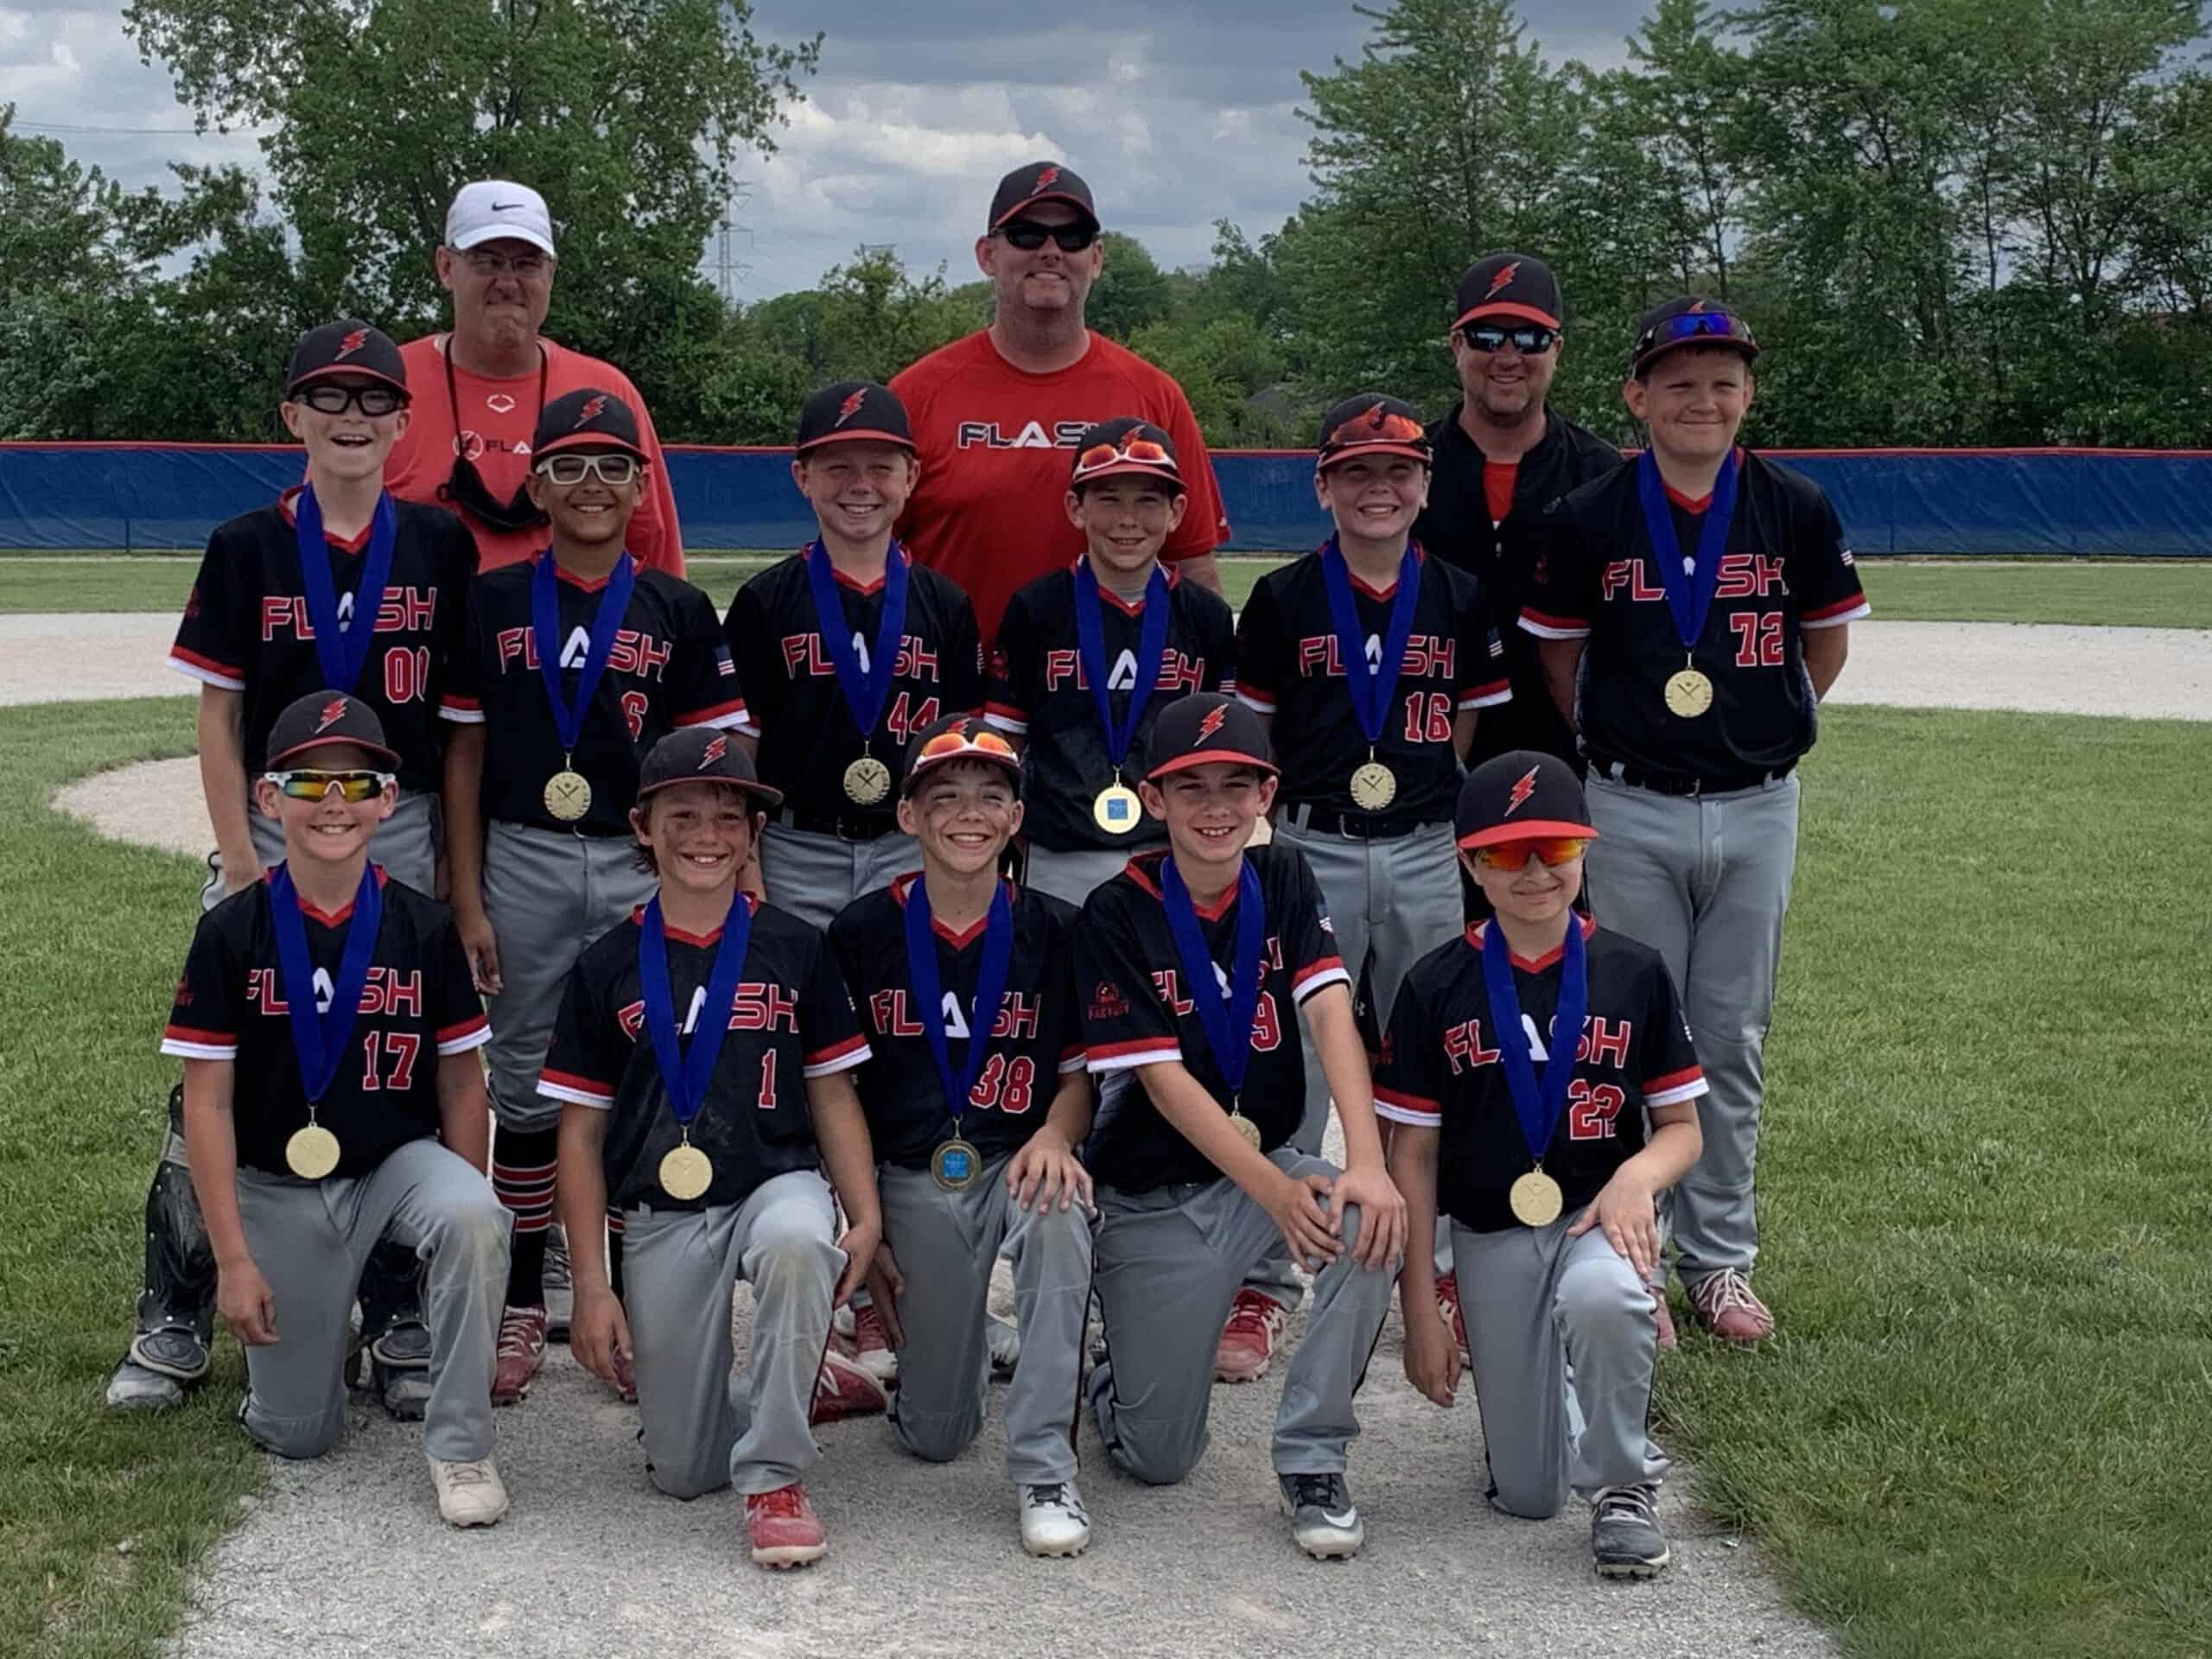 11 U boys Flash baseball team and coaches kneeling for Ho Chunk Slamfest wearing championship medals